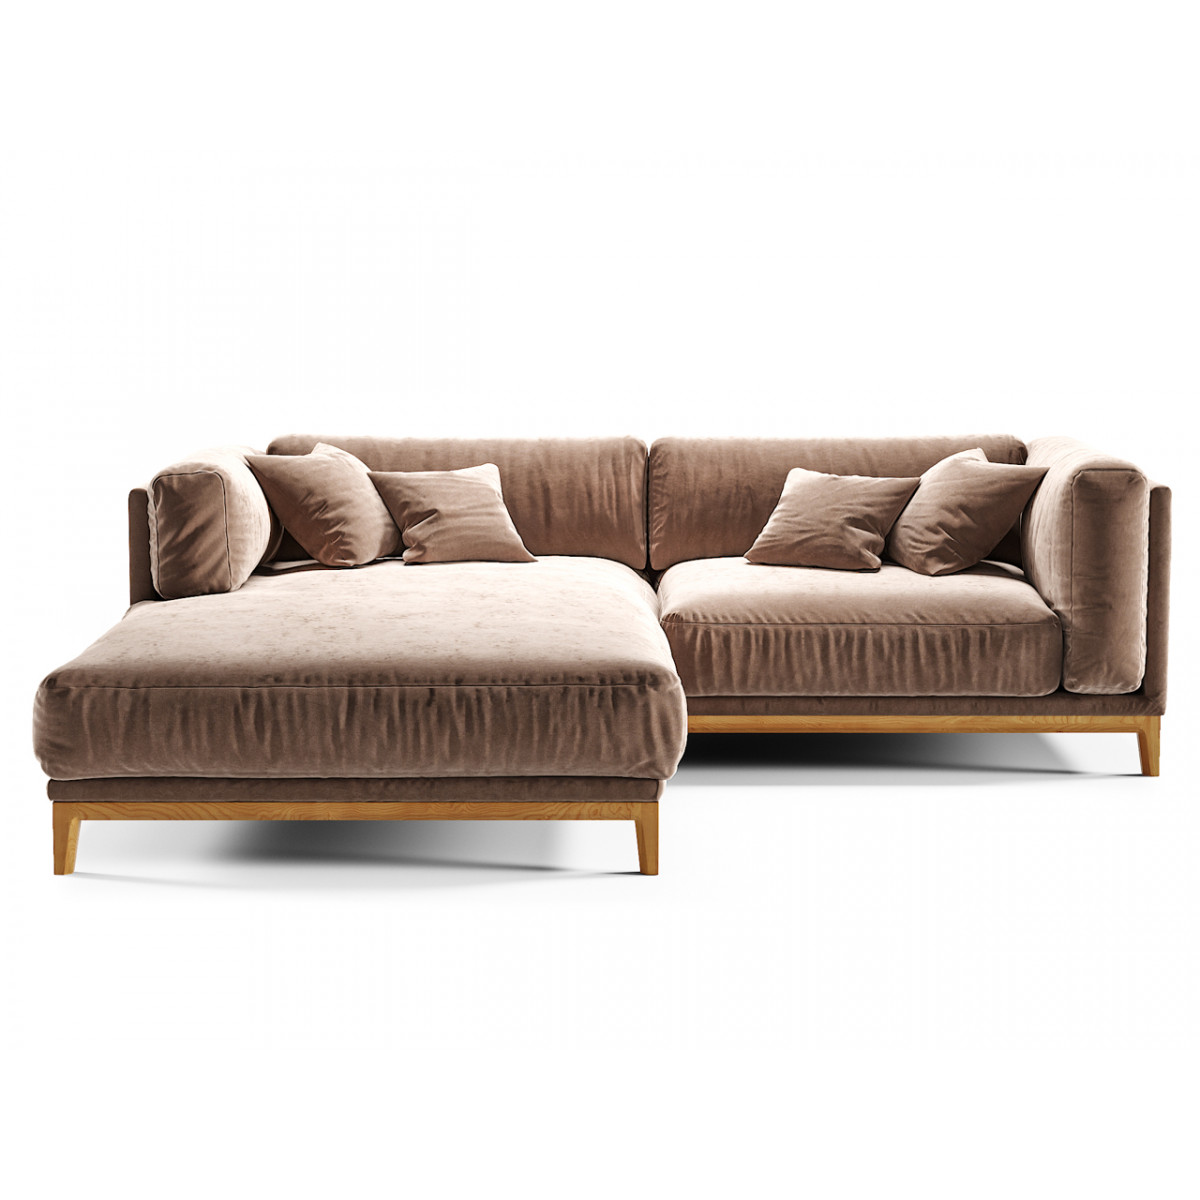 The idea диван case бежевый 134083/8